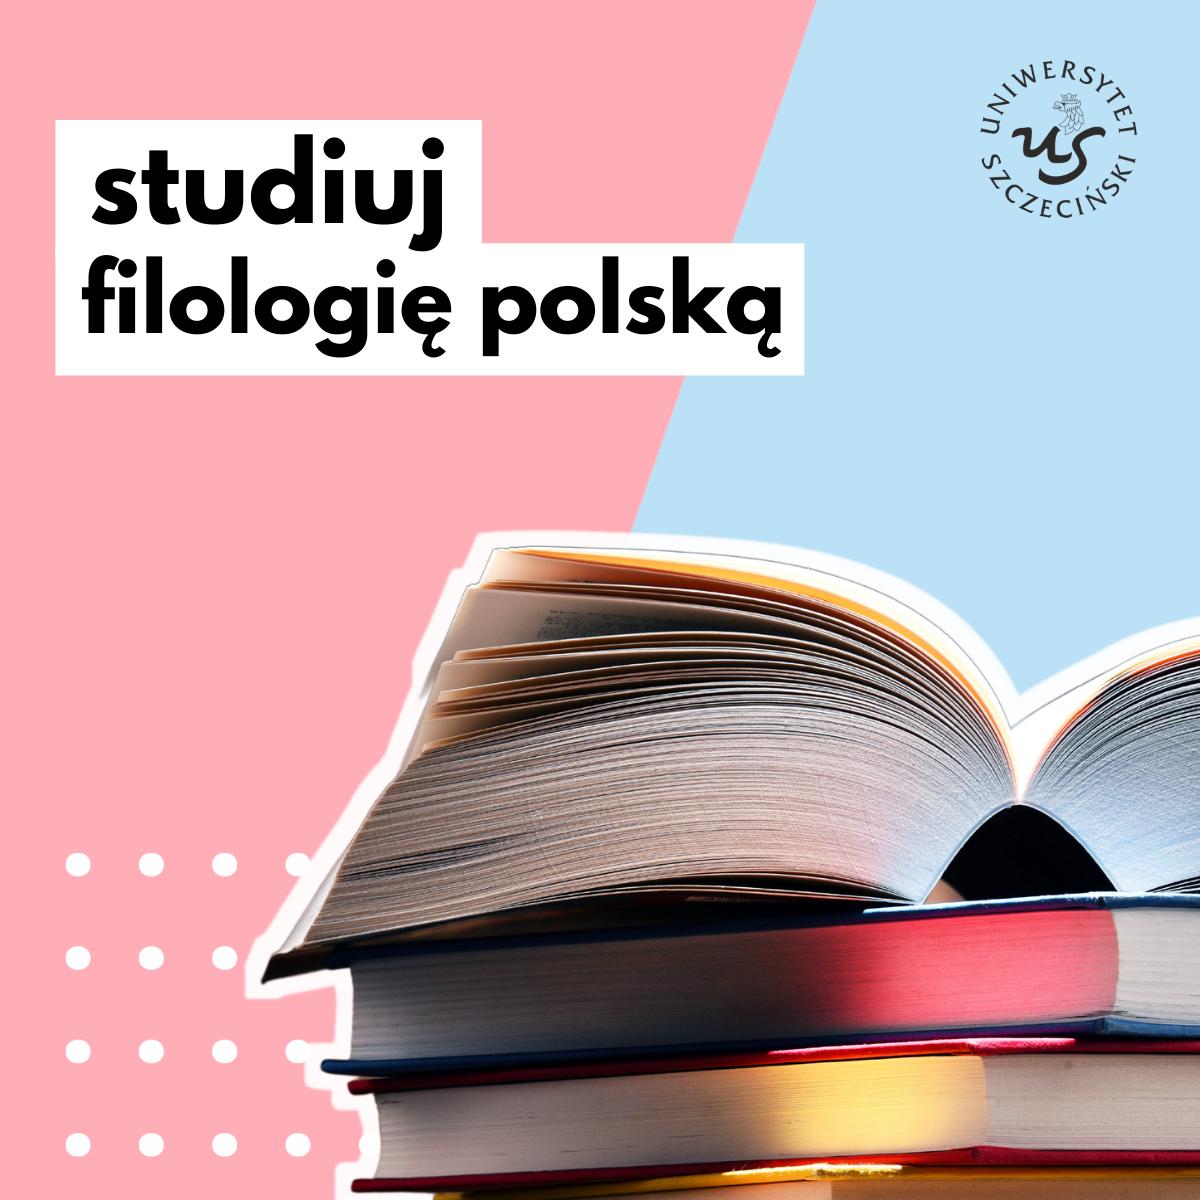 Filologia polska – zapraszamy na studia!